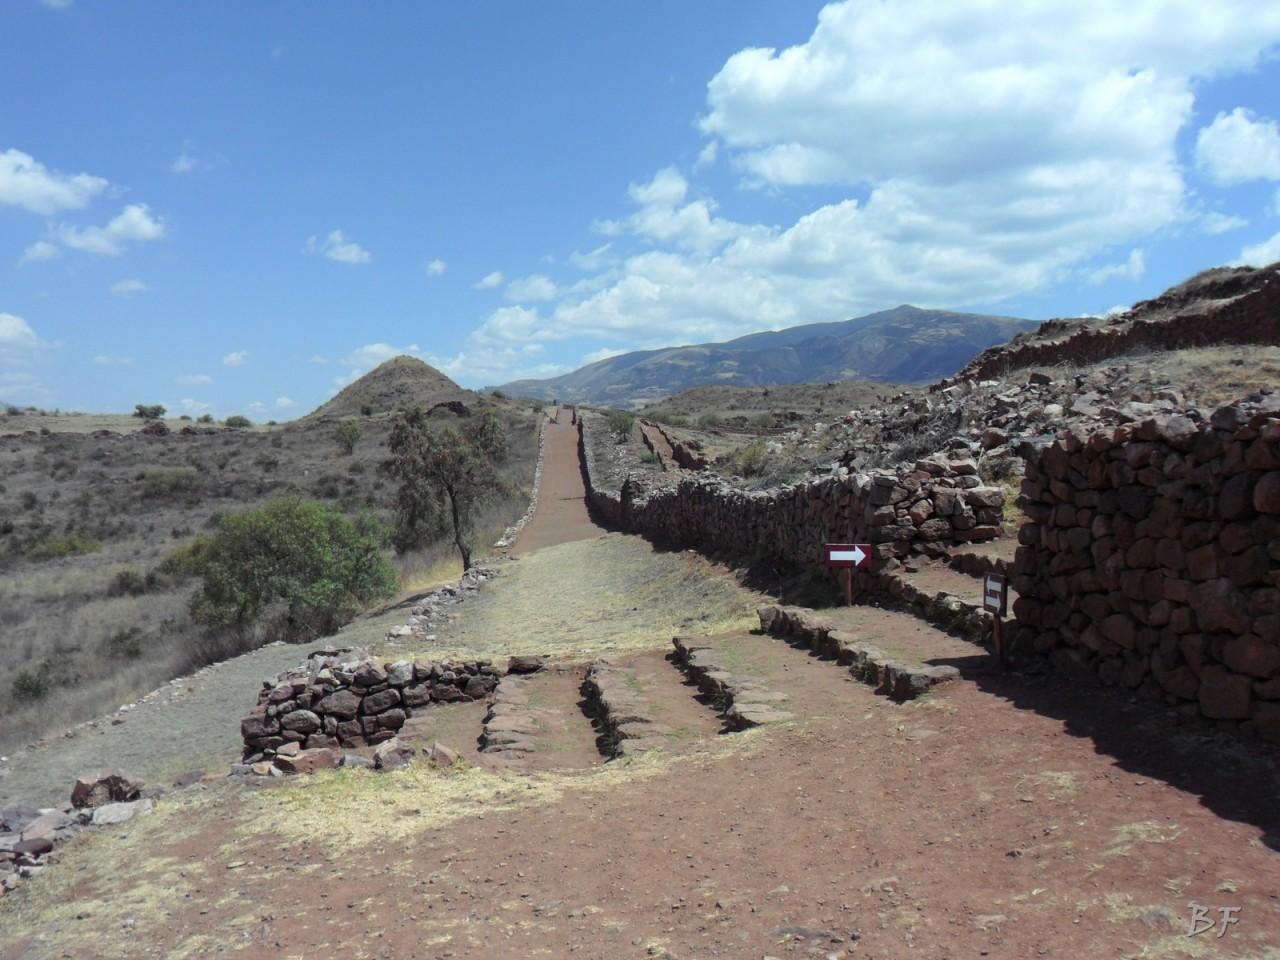 Parco-Archeologico-Megaliti-Pikillacta-Andahuaylillas-Cusco-Perù-16